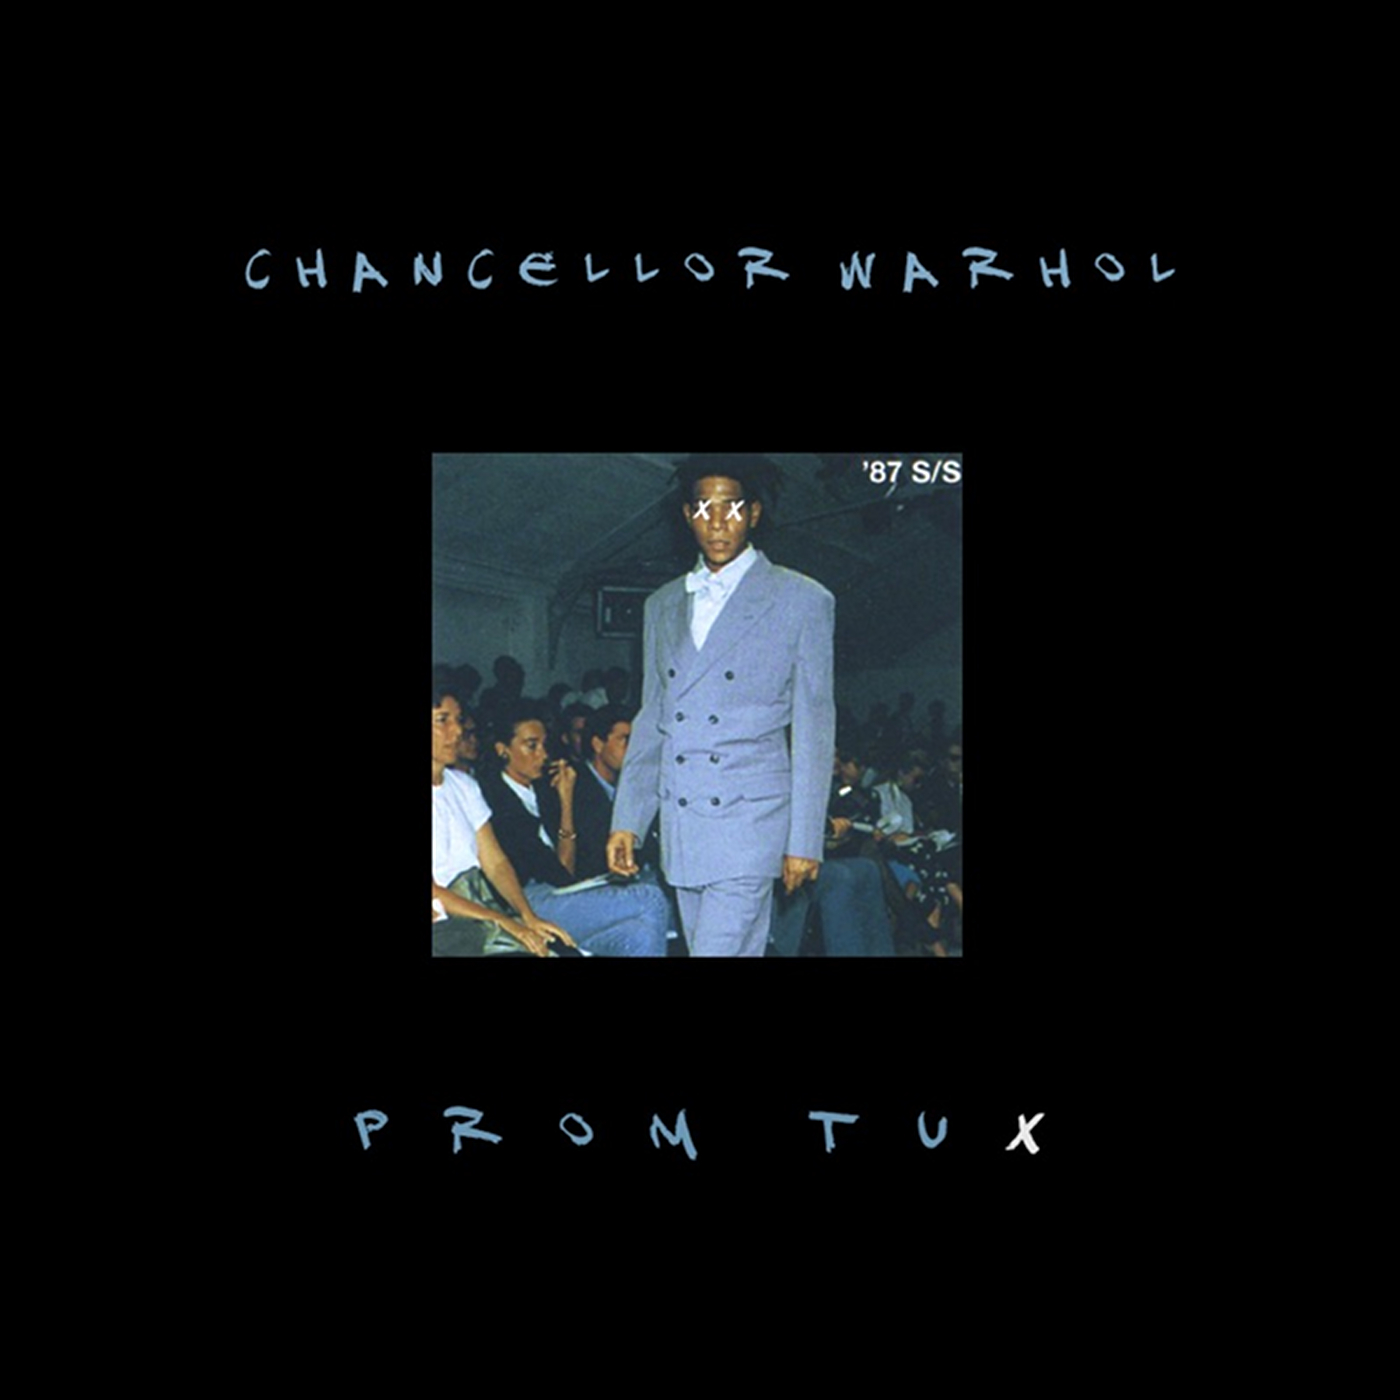 SXS040 Chancellor Warhol - Prom Tux